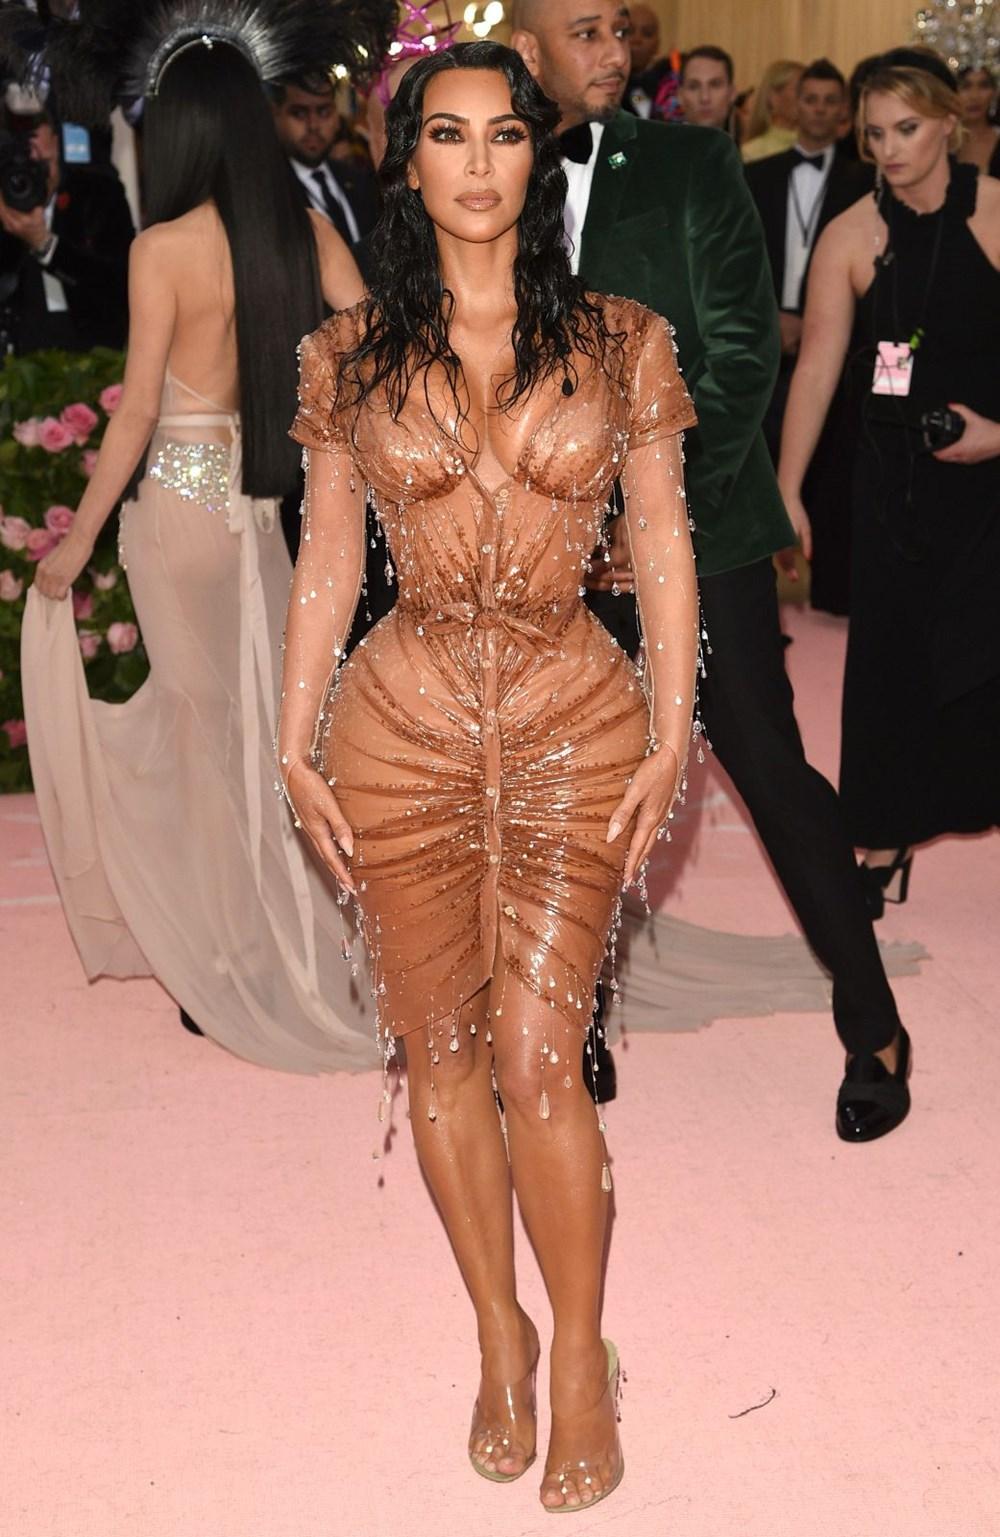 Kim Kardashian'a elmas yüzük ve doğum kontrol hapıyla taciz - 10